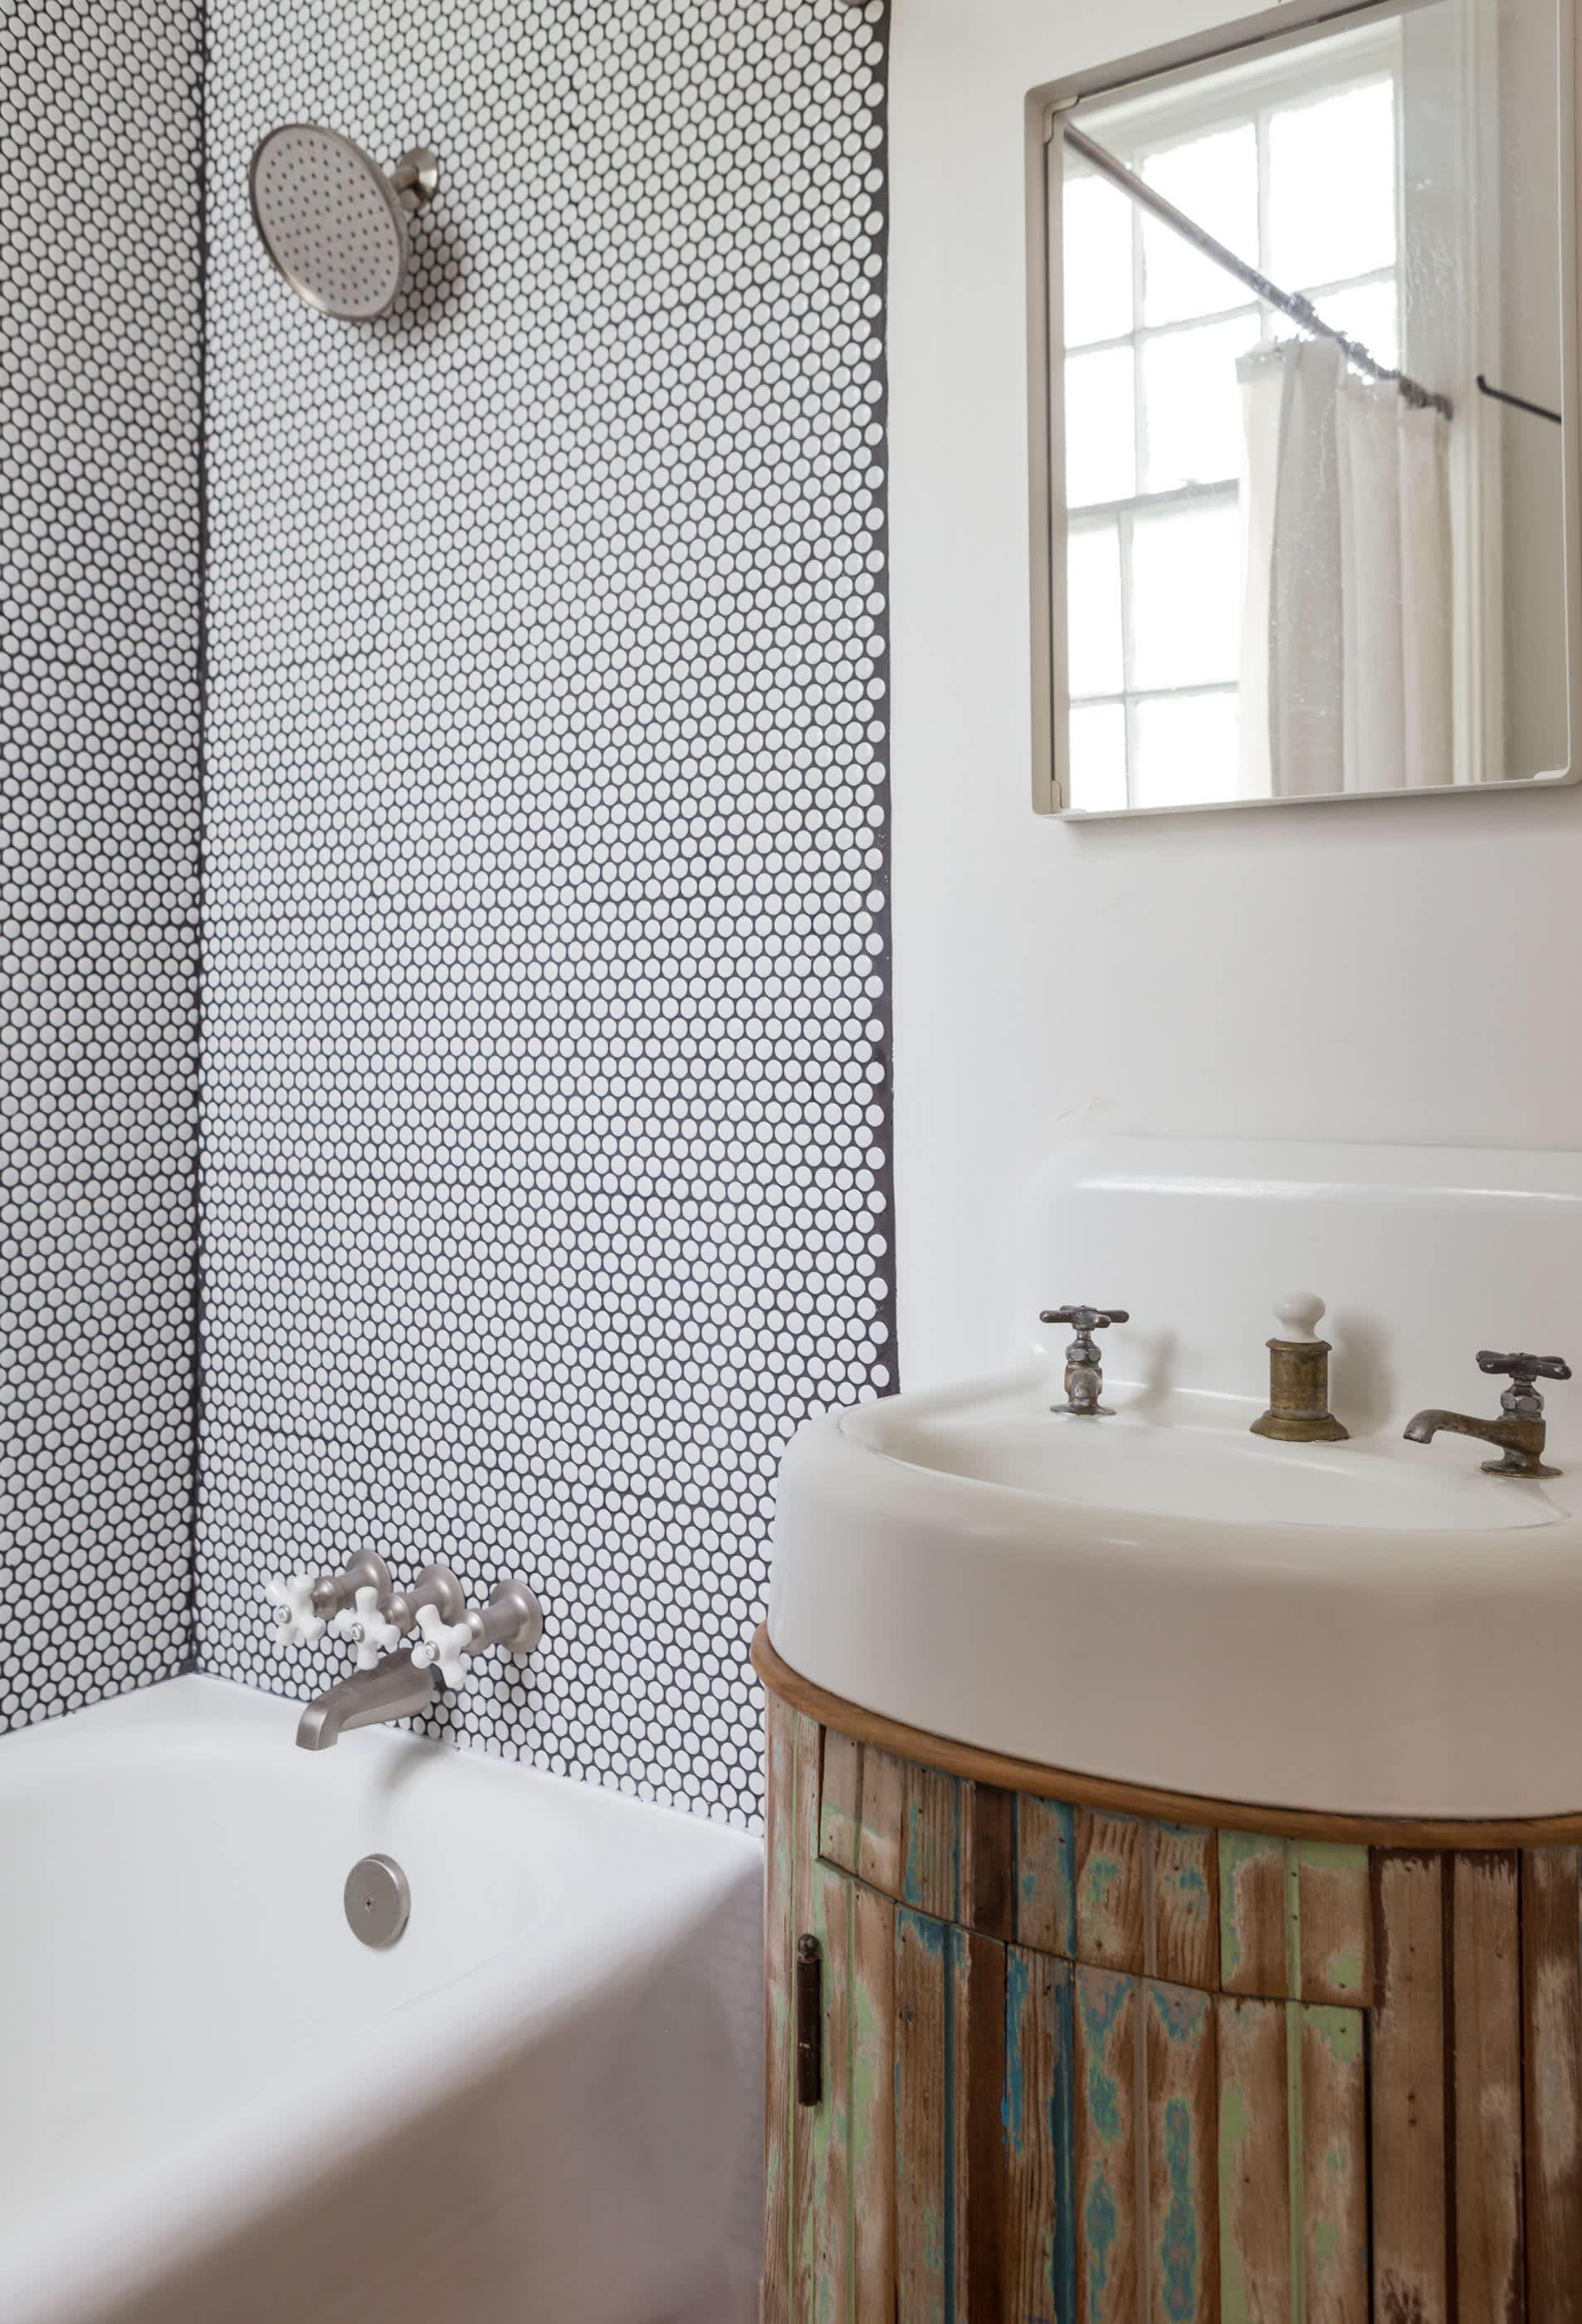 Floor, Shower, Wall Designs